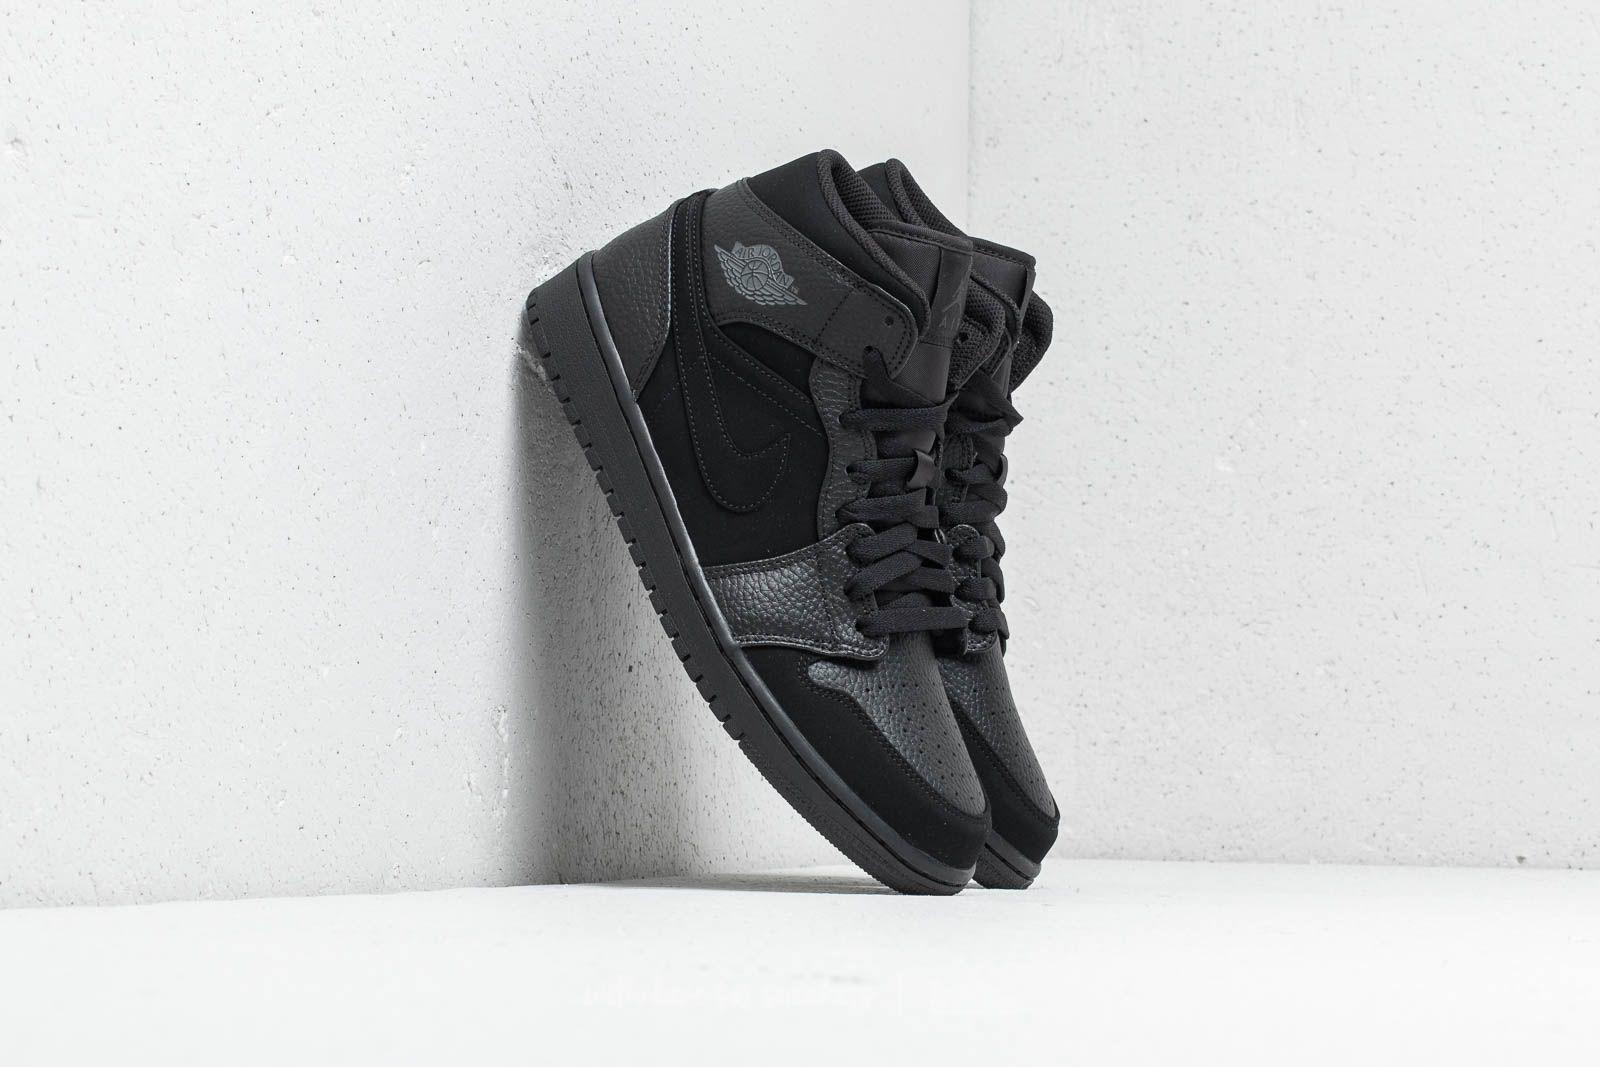 Air Jordan 1 Mid Black/ Dark Smoke Grey-Black za skvělou cenu 2 390 Kč koupíte na Footshop.cz